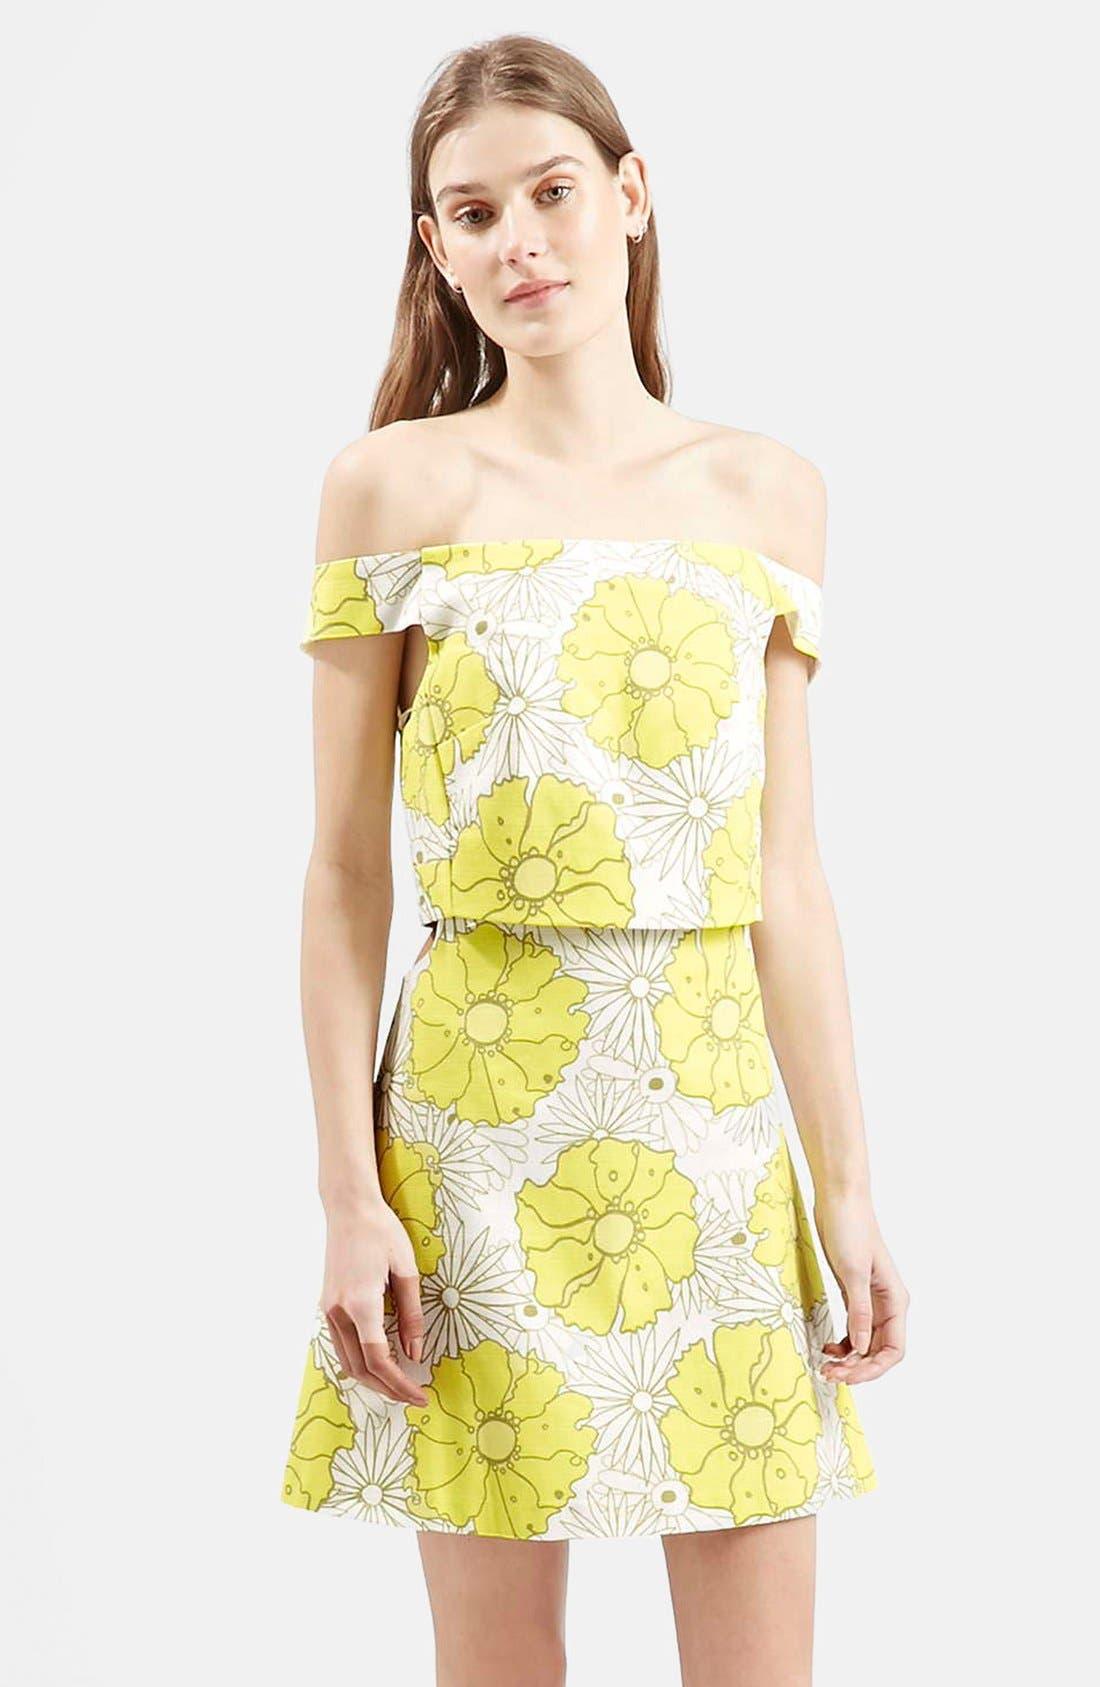 Main Image - Topshop 'Abigail' Floral Print Off the Shoulder Dress